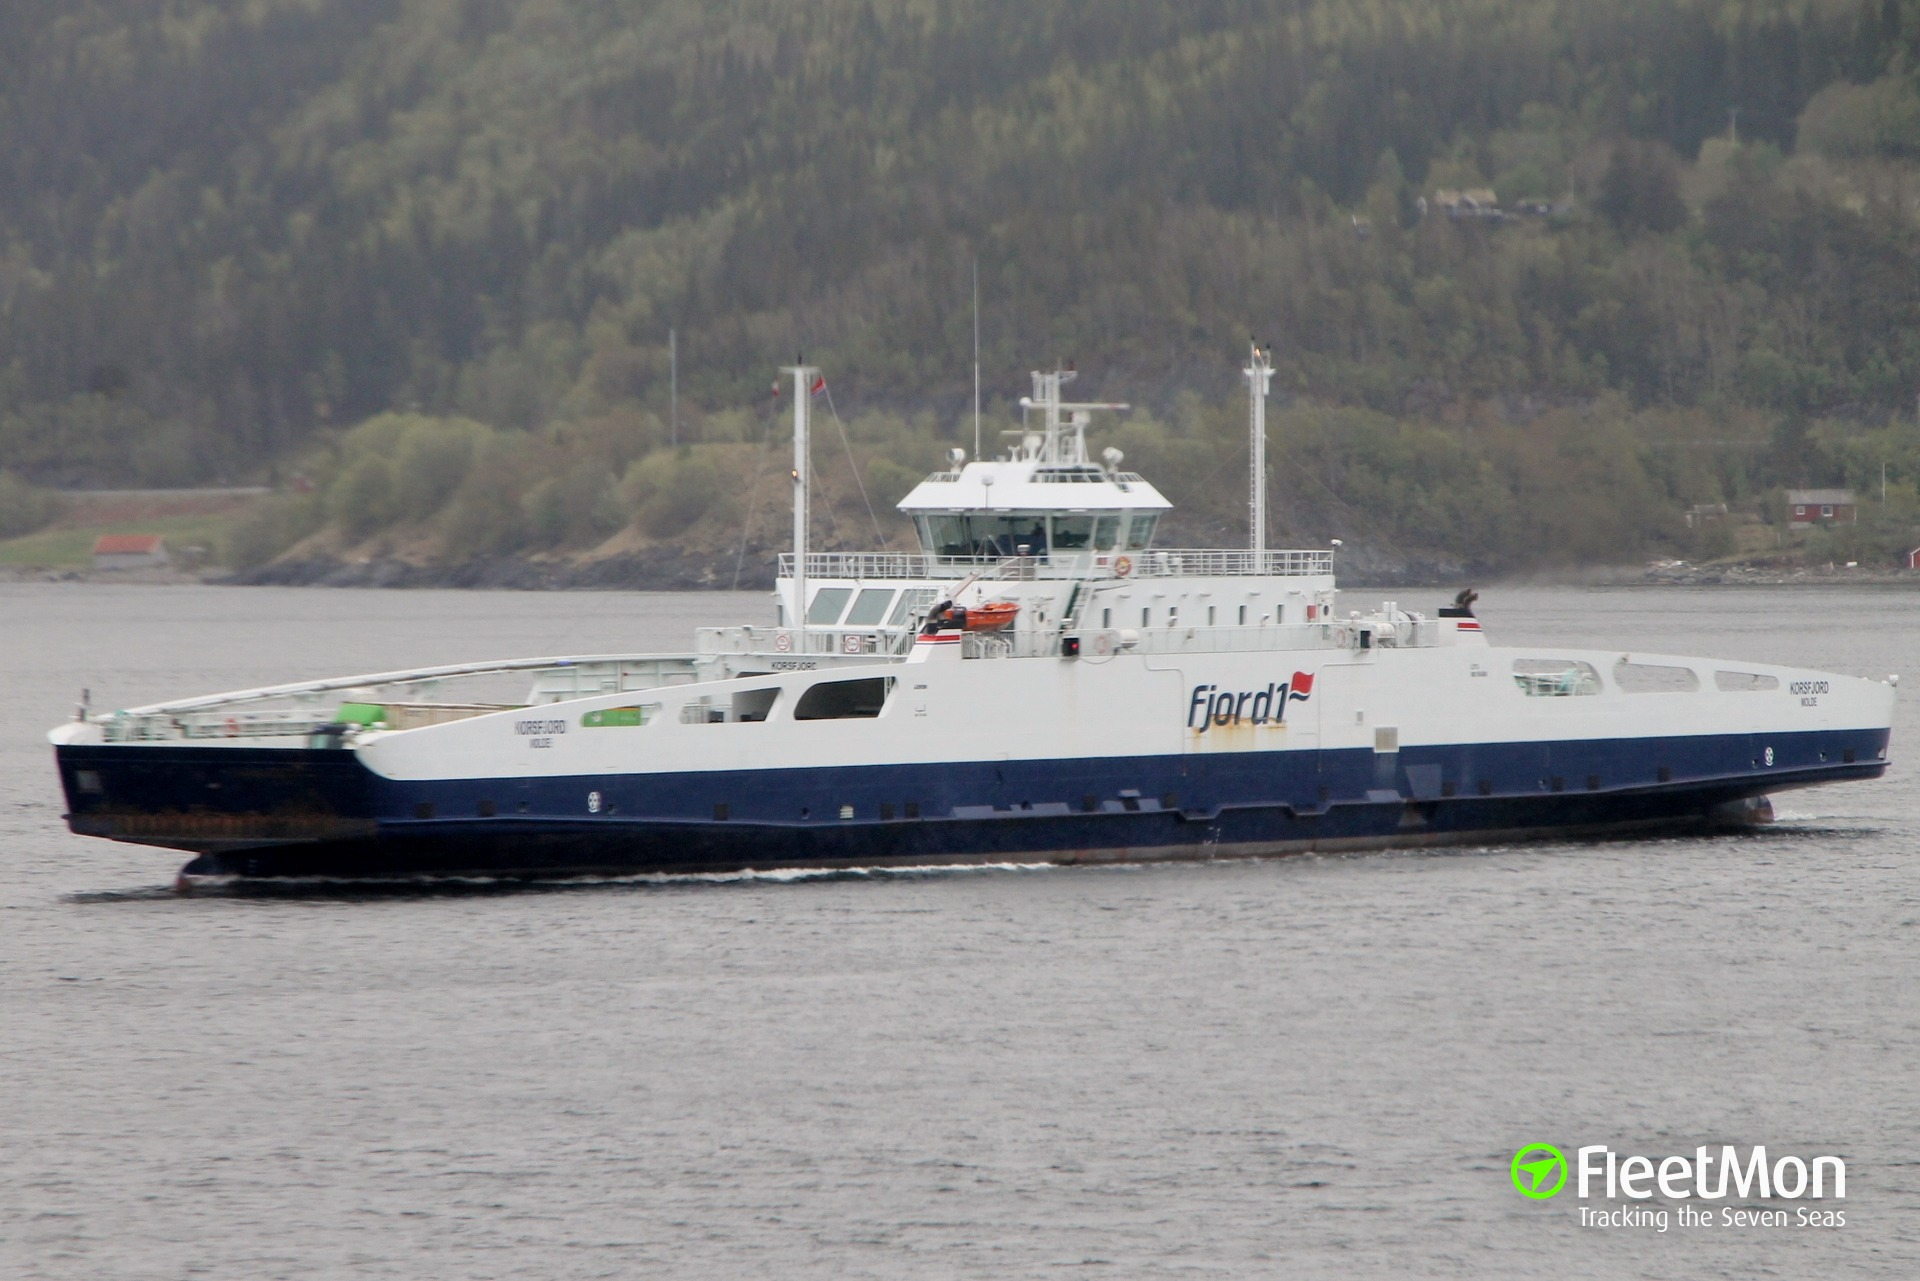 Ferry Korsfjord fire